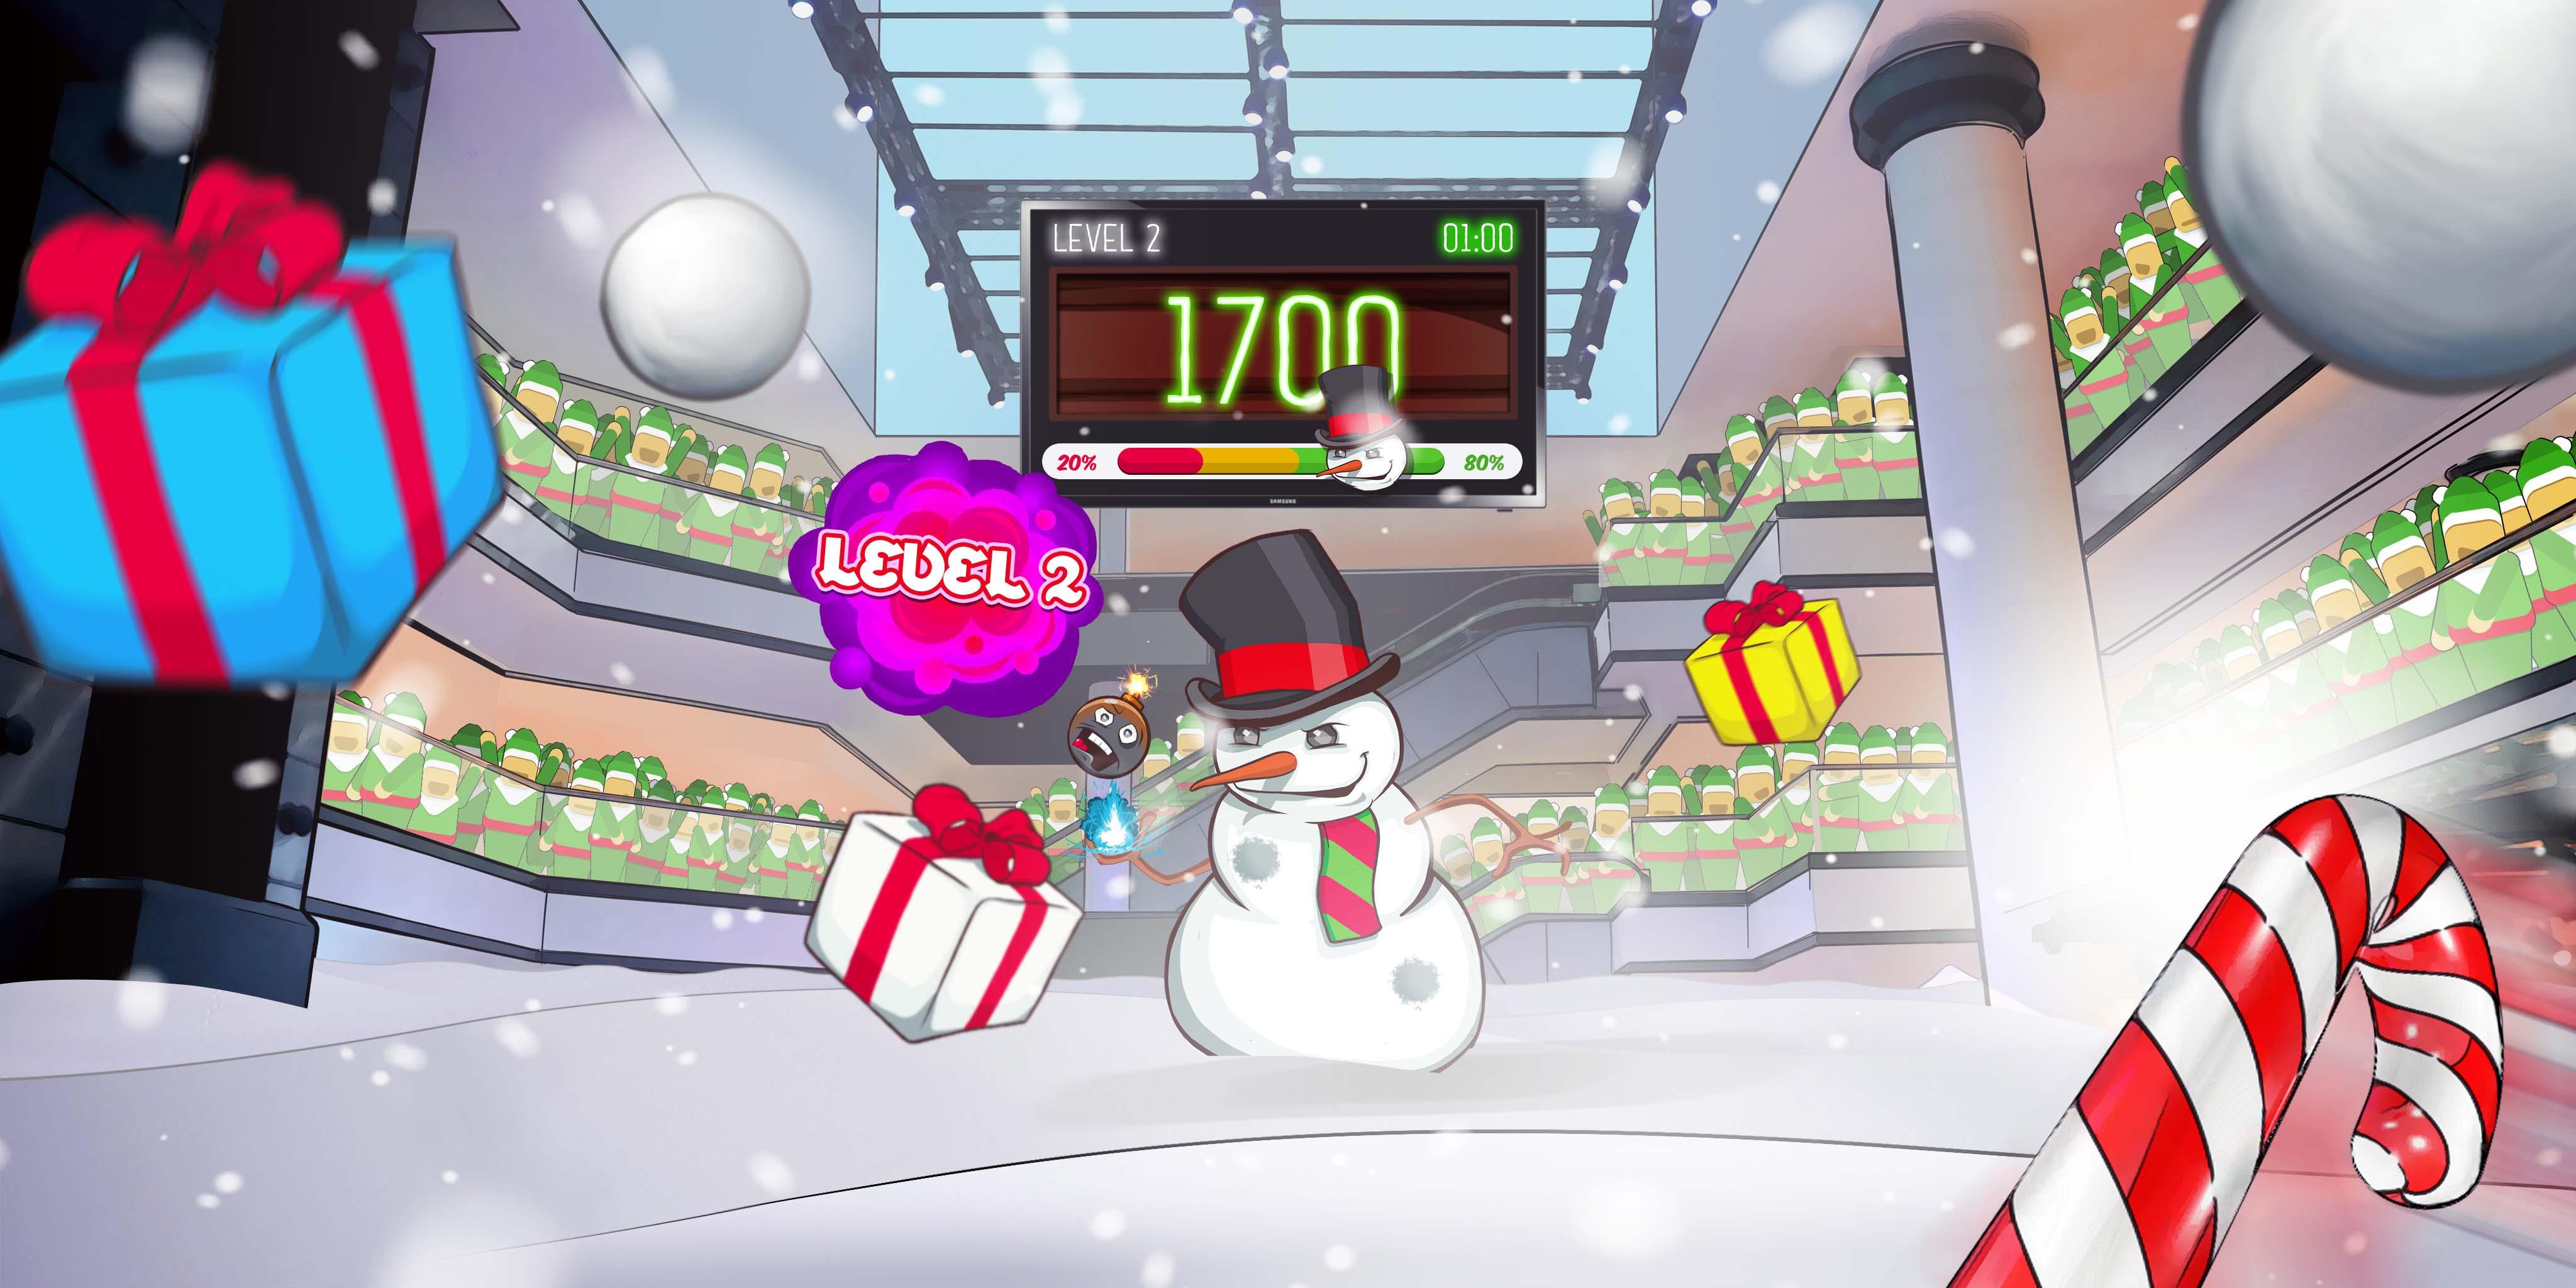 Market City Candy Cane VR Fight